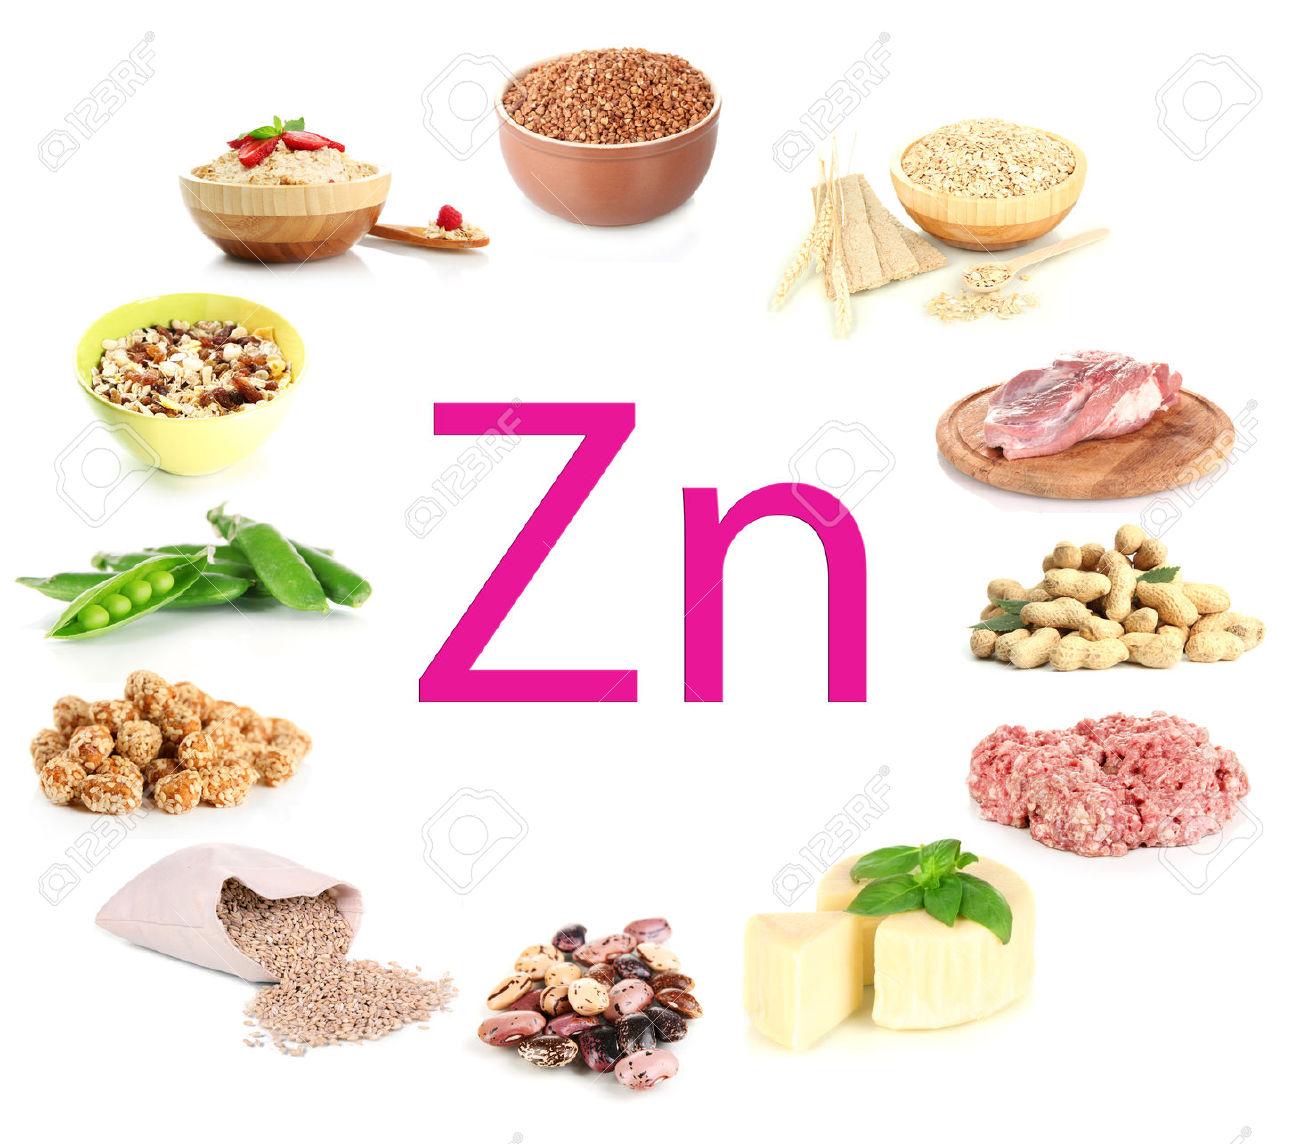 http://www.123rf.com/photo_23382881_collage-of-products-containing-zinc.html?term=zinc&vti=ni0135yvapi0b3yld8